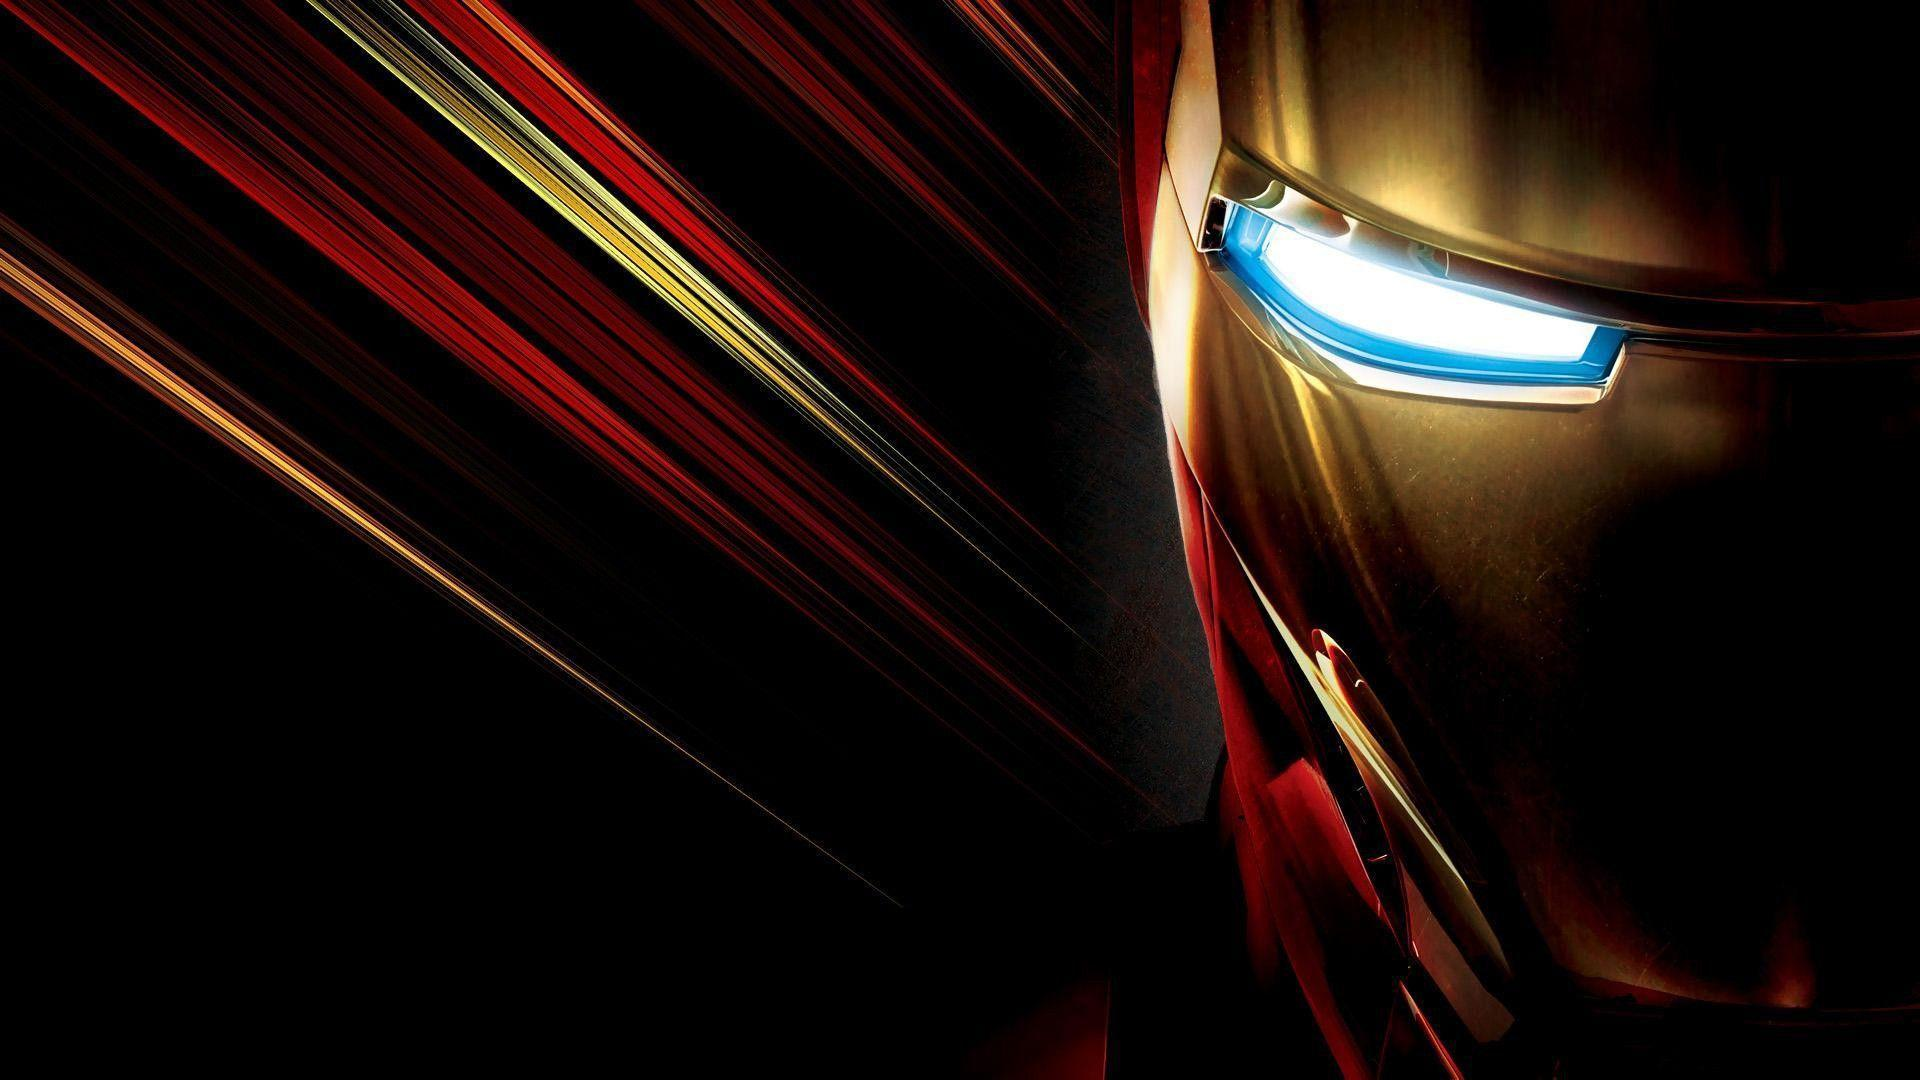 131 Iron Man Wallpapers | Iron Man Backgrounds